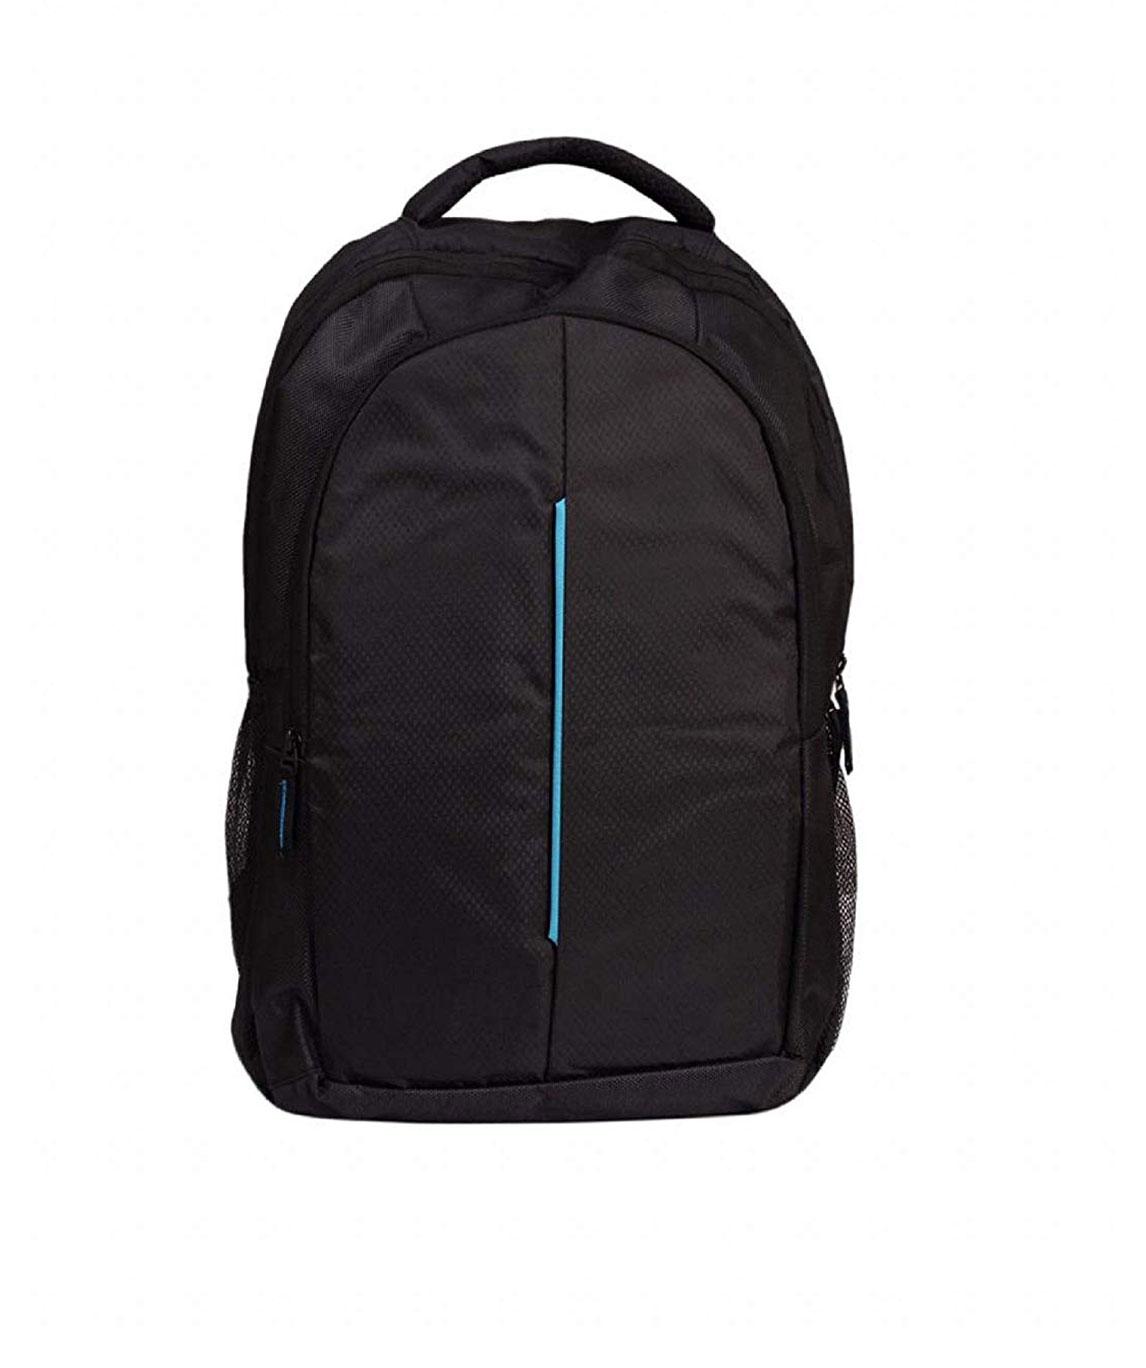 Faisal Raza Expandable Laptop Backpack (Multi) (Black::Blue)